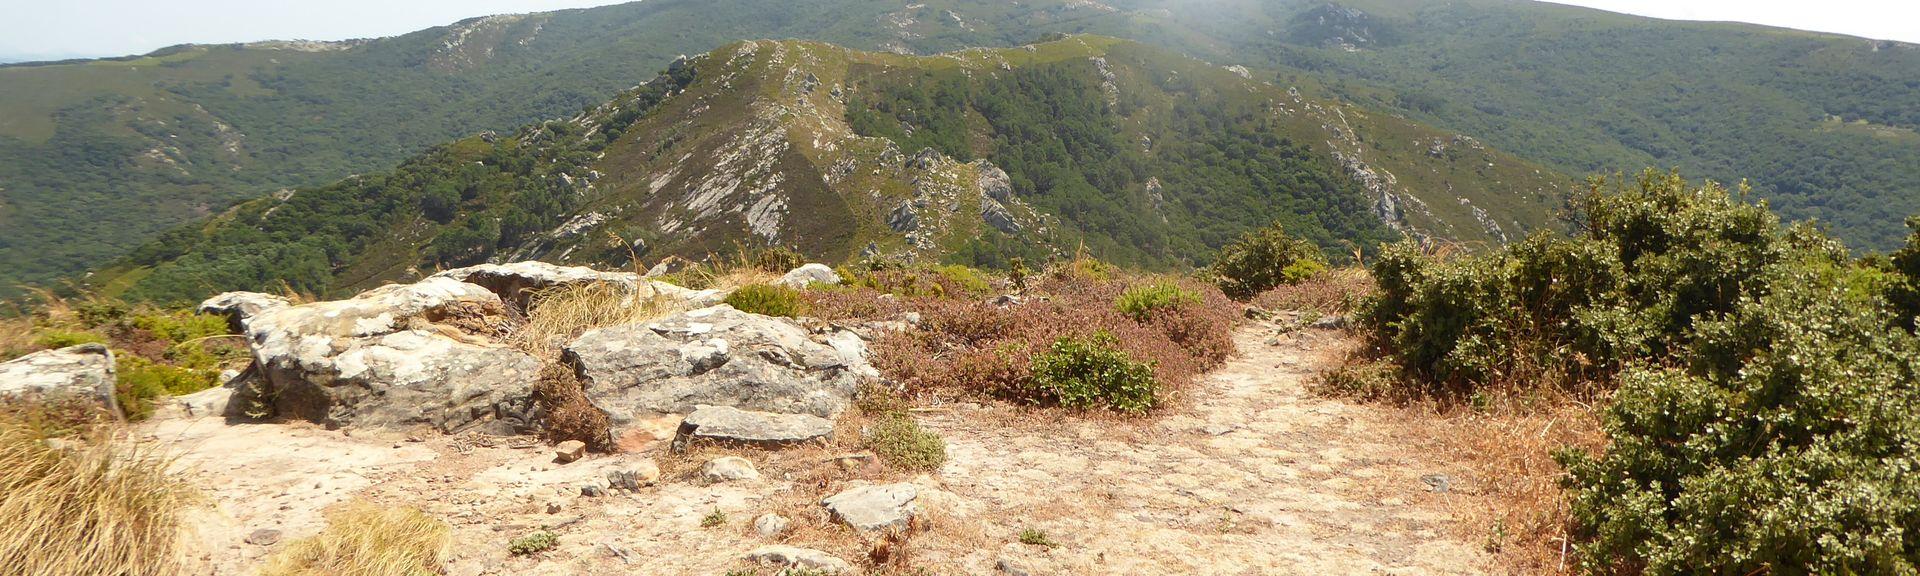 Cortes de la Frontera, Andalusia, Espanja